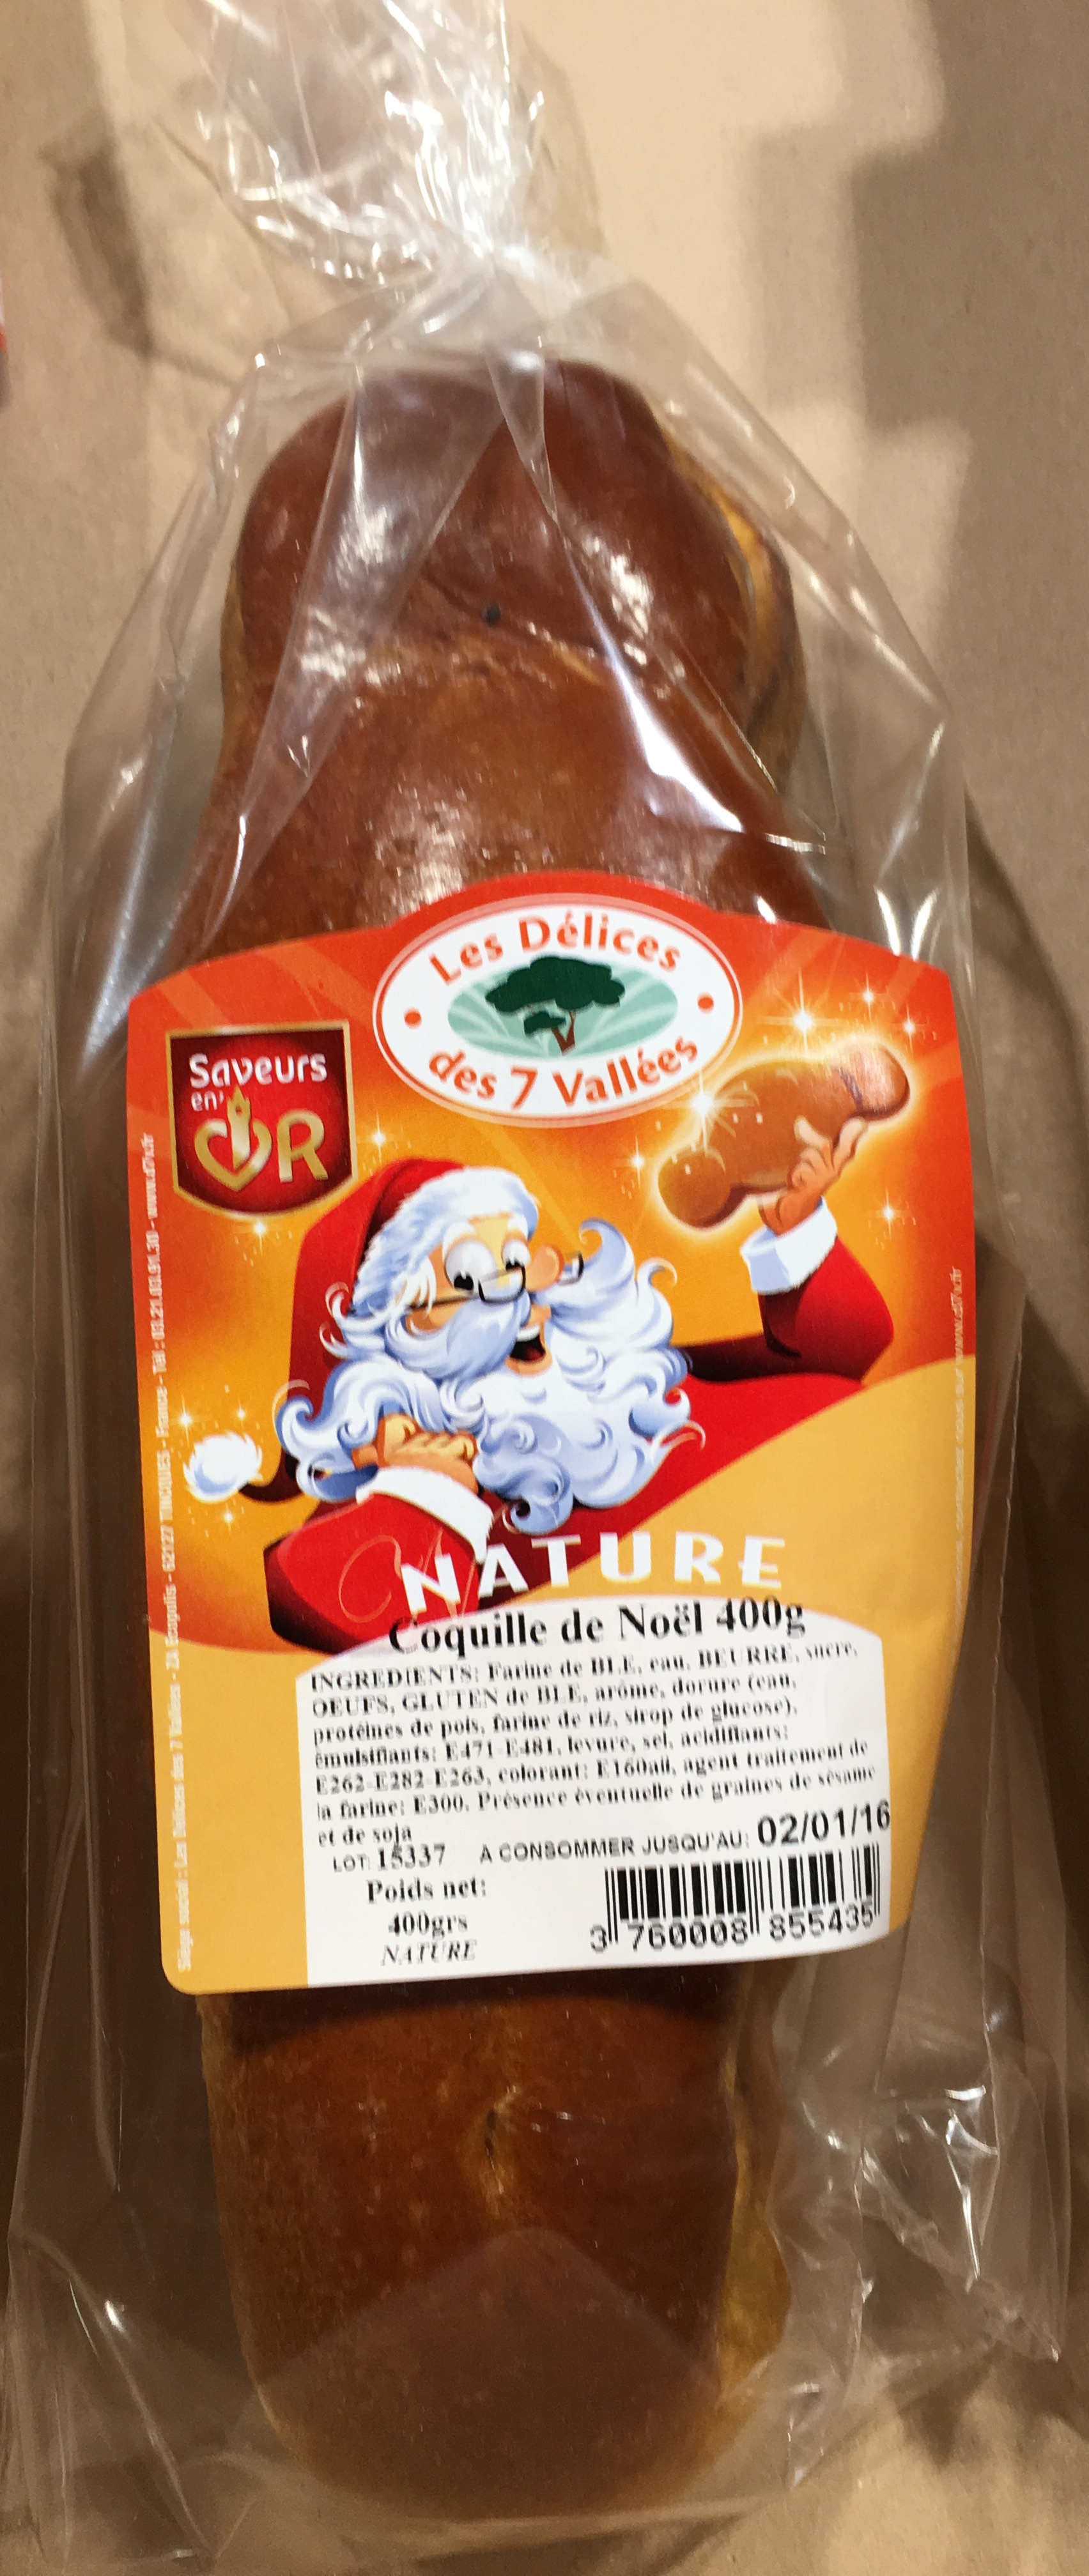 Coquille de Noël Nature - Product - fr